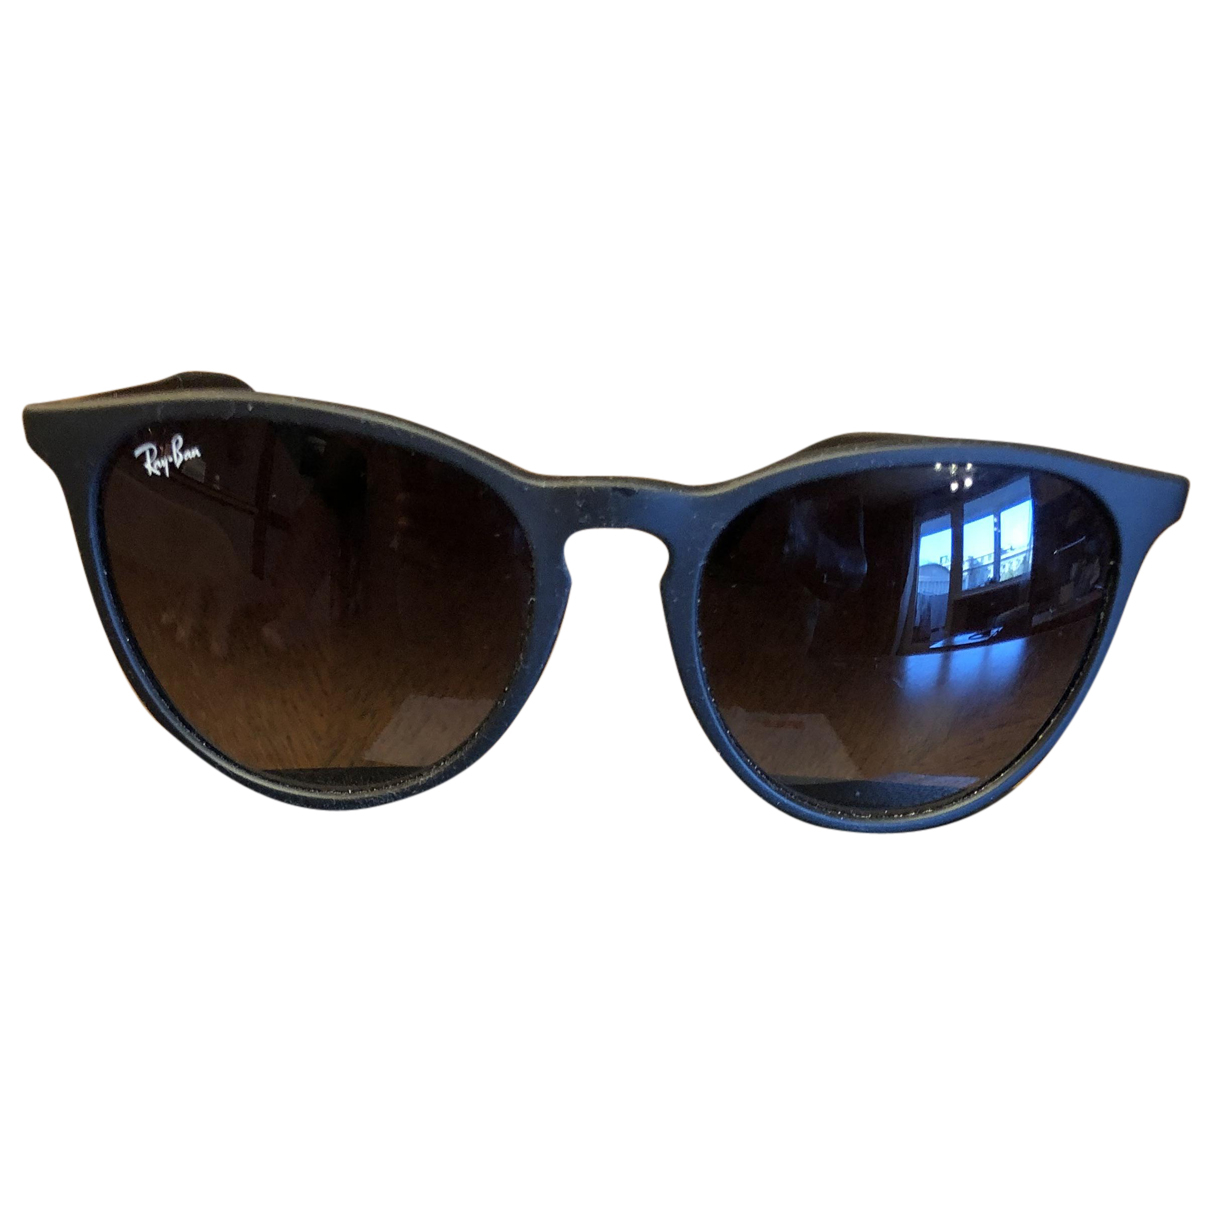 Ray-ban Round Black Sunglasses for Men N